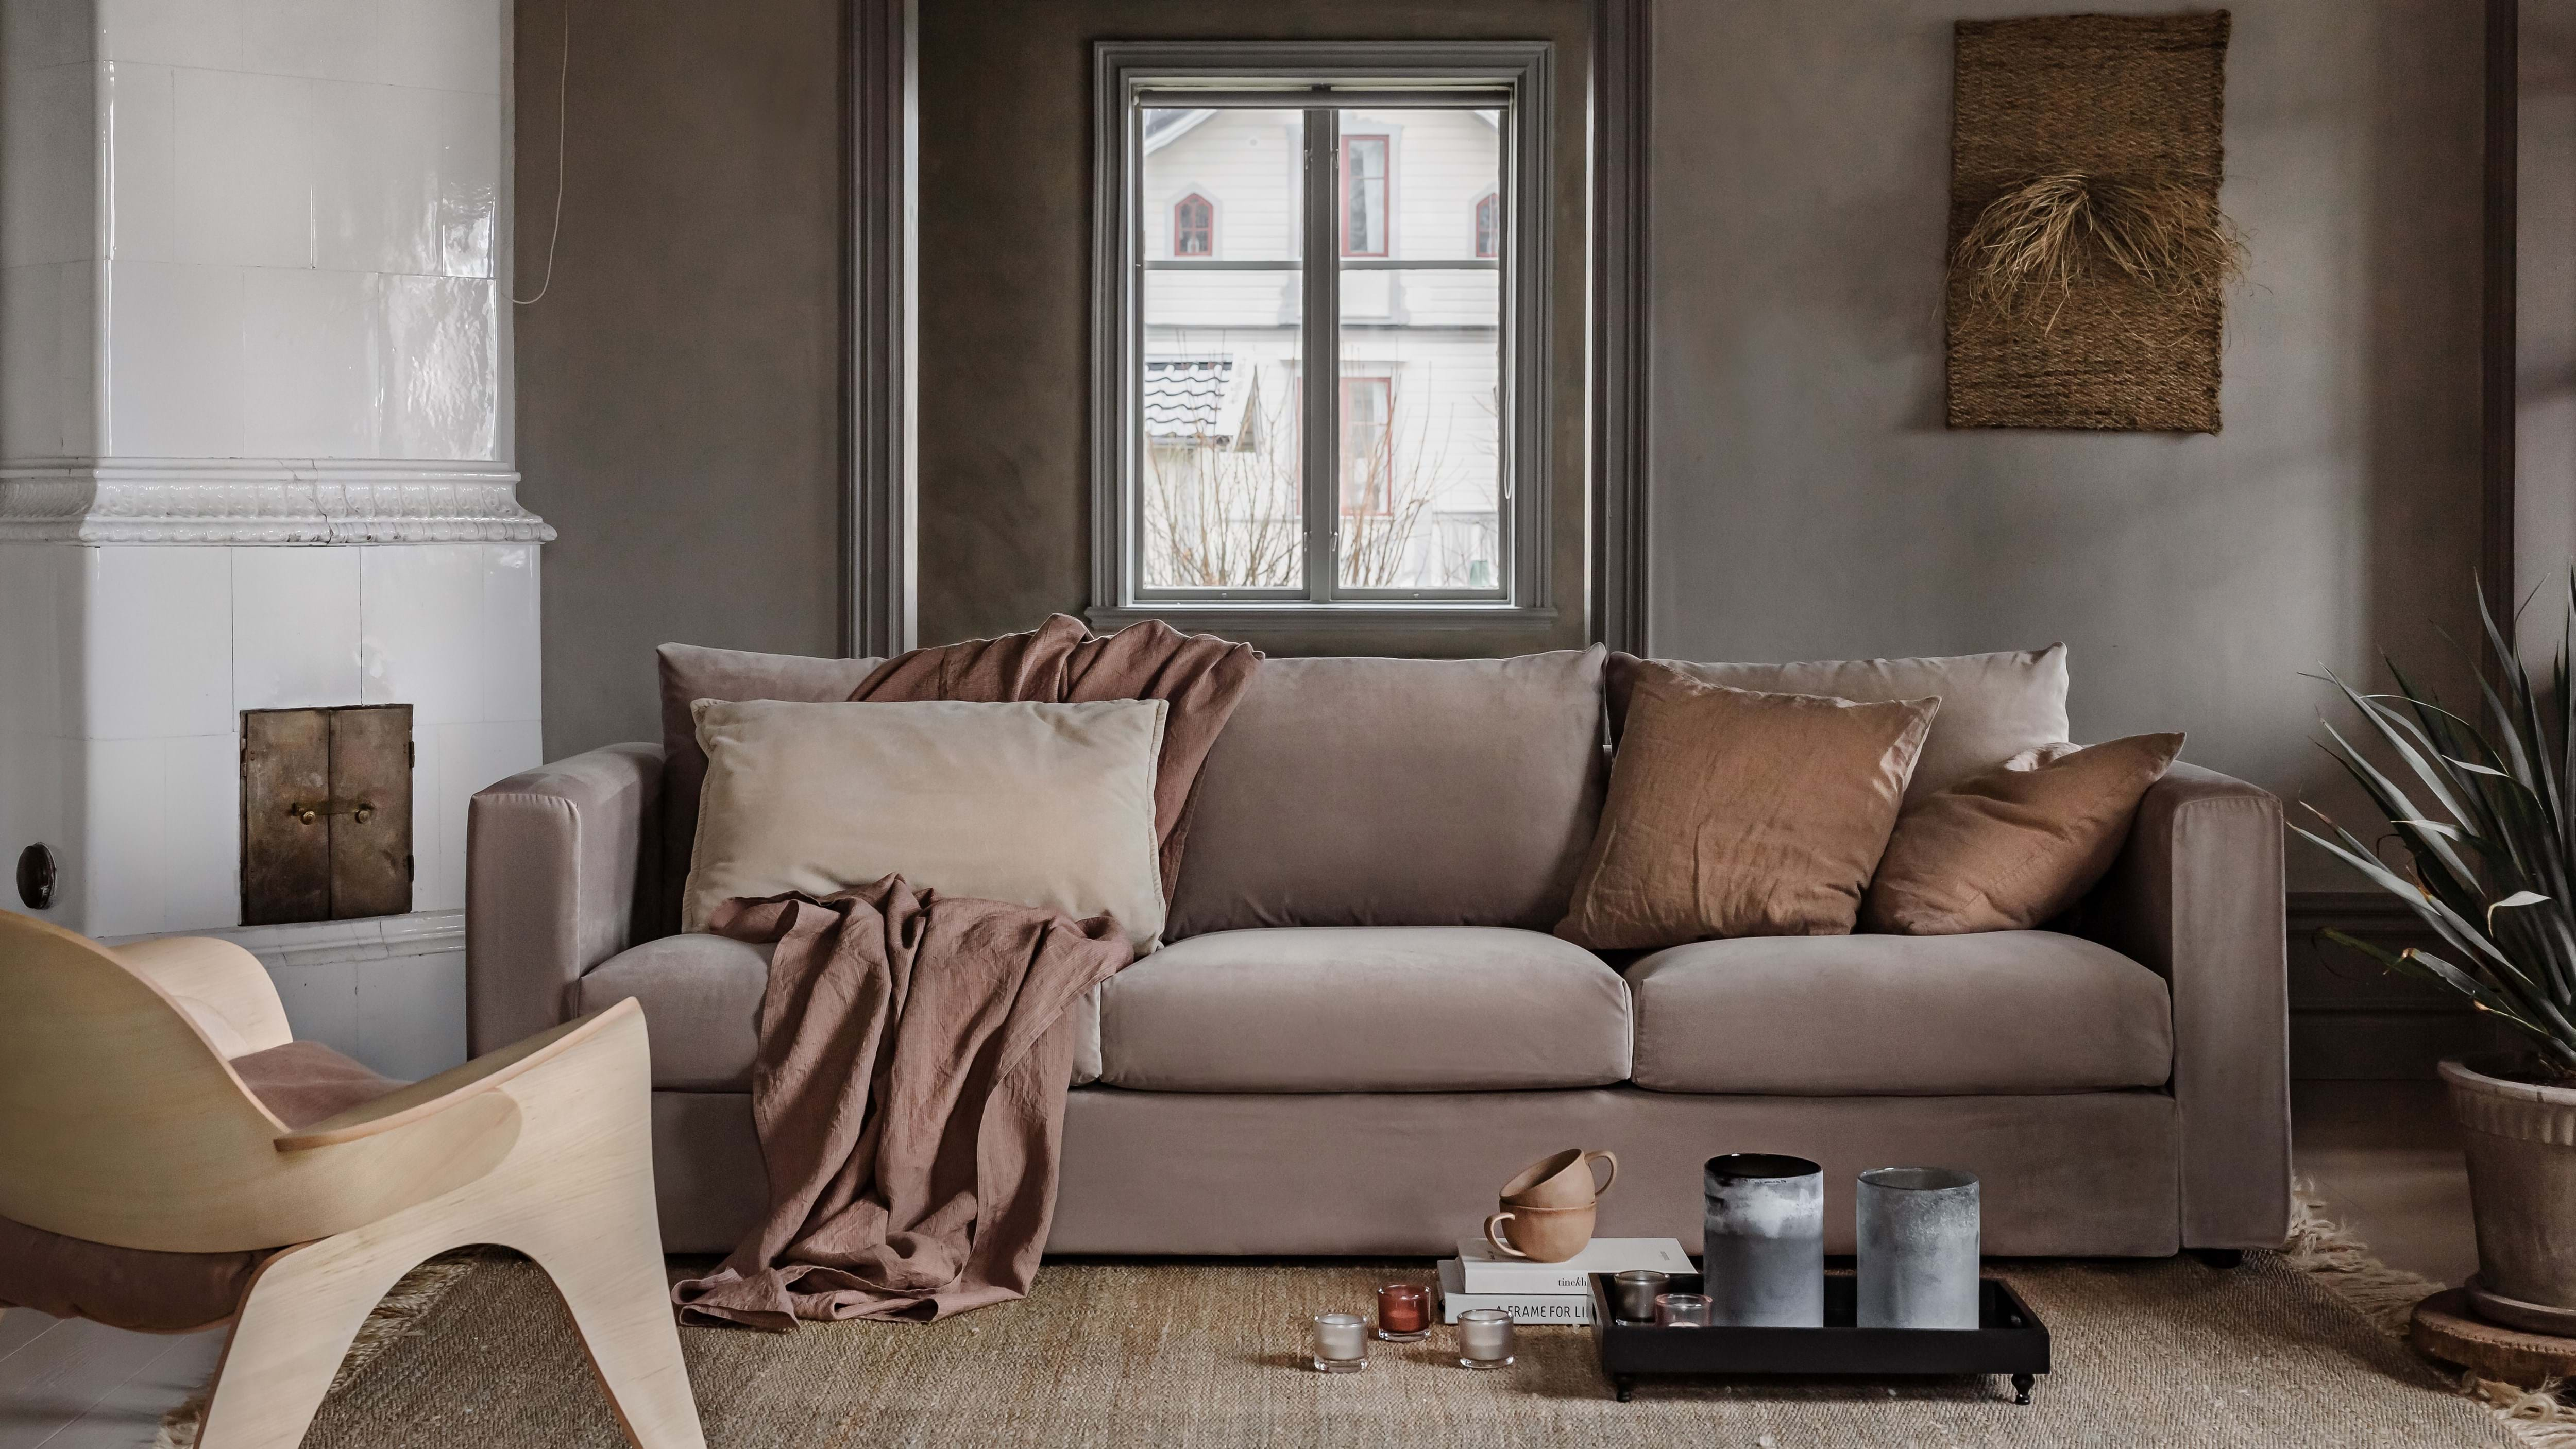 IKEA Vimle soffa översikt by Bemz | Bemz